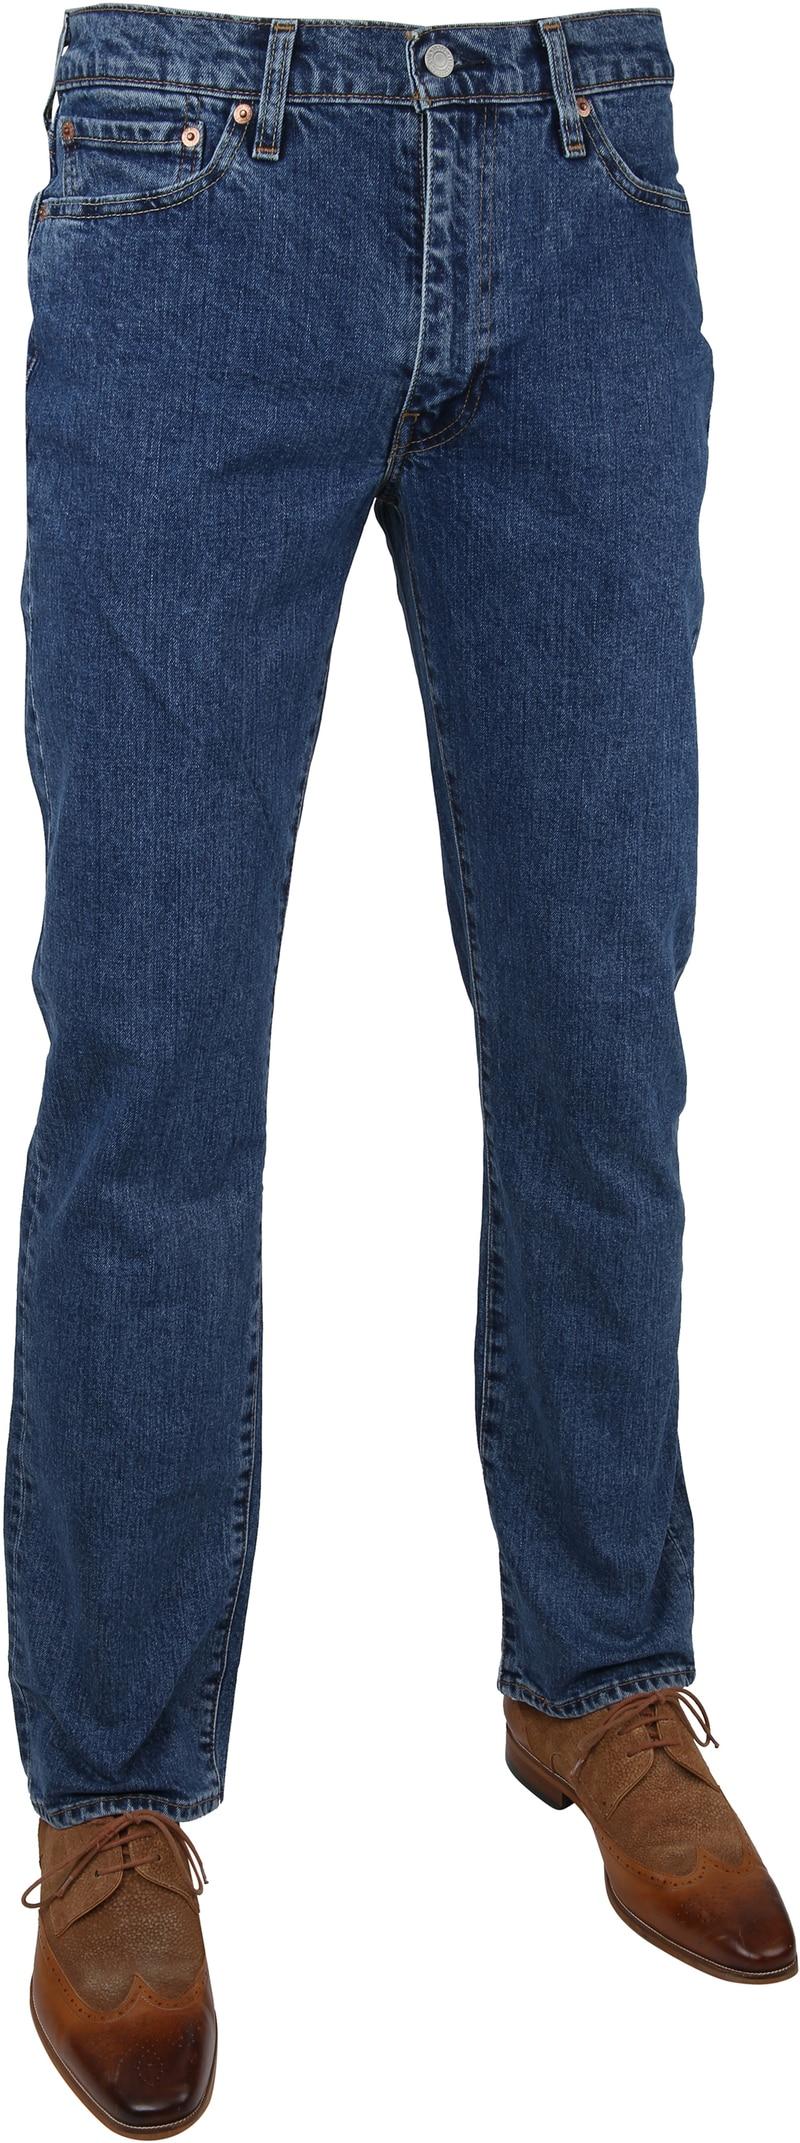 Levi's 514 Jeans Regular Fit Stonewash foto 0